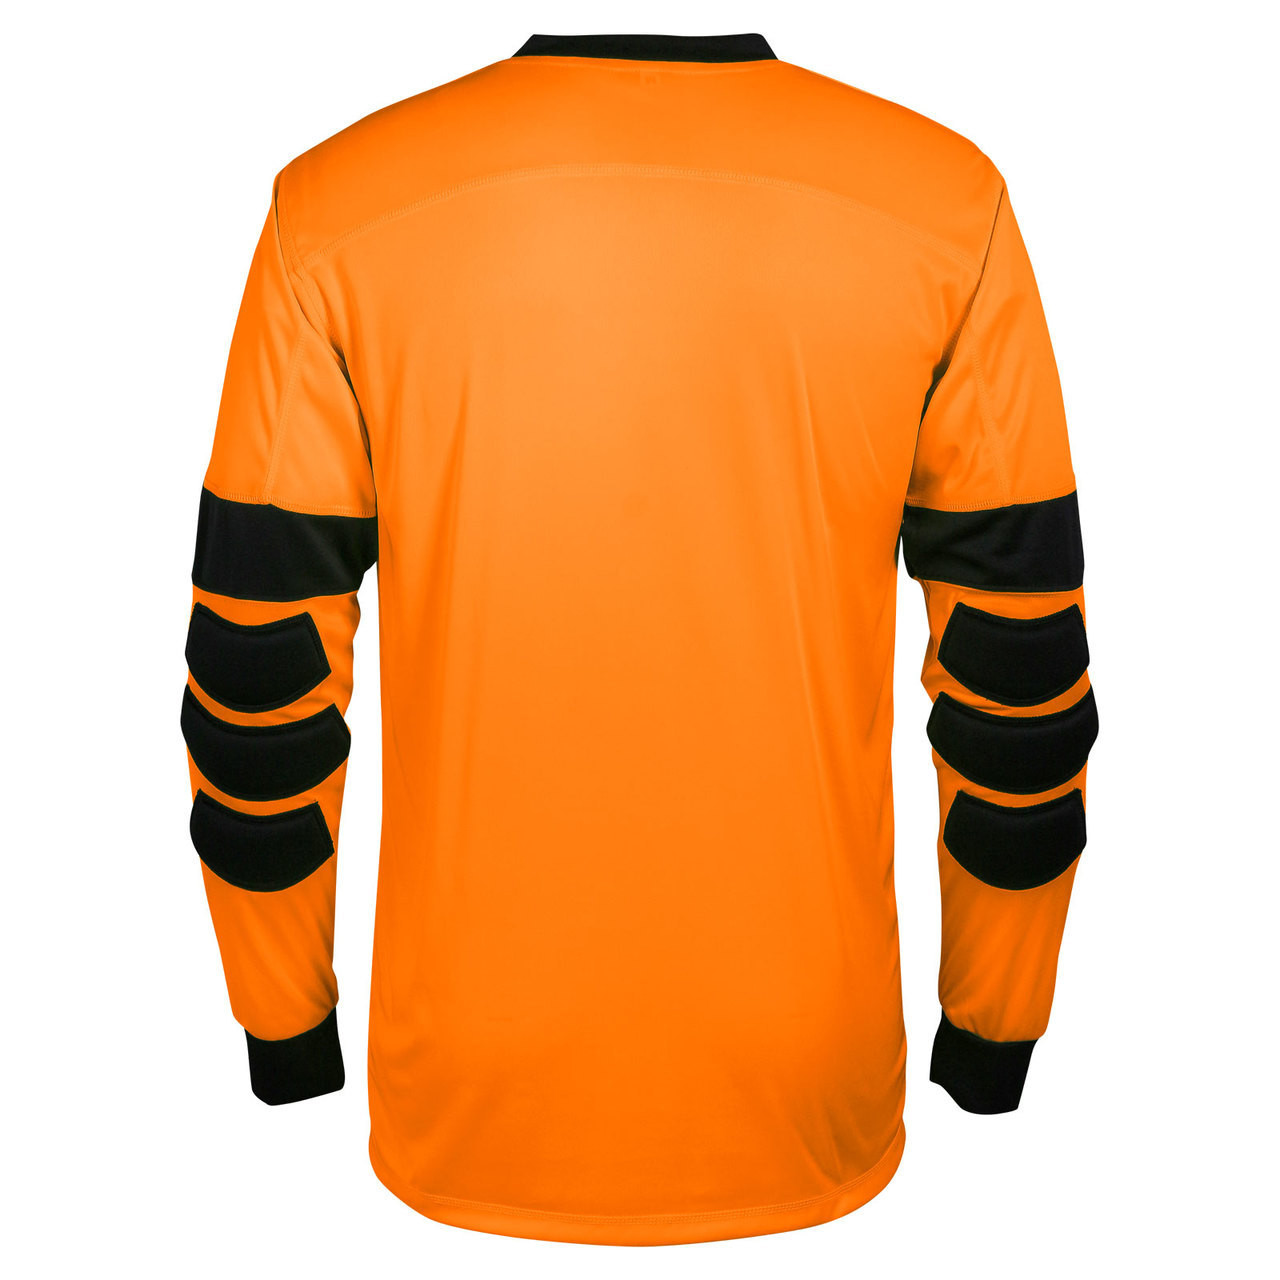 22b9151aa Champro Keeper Soccer Goalie Jersey - Athletic Stuff